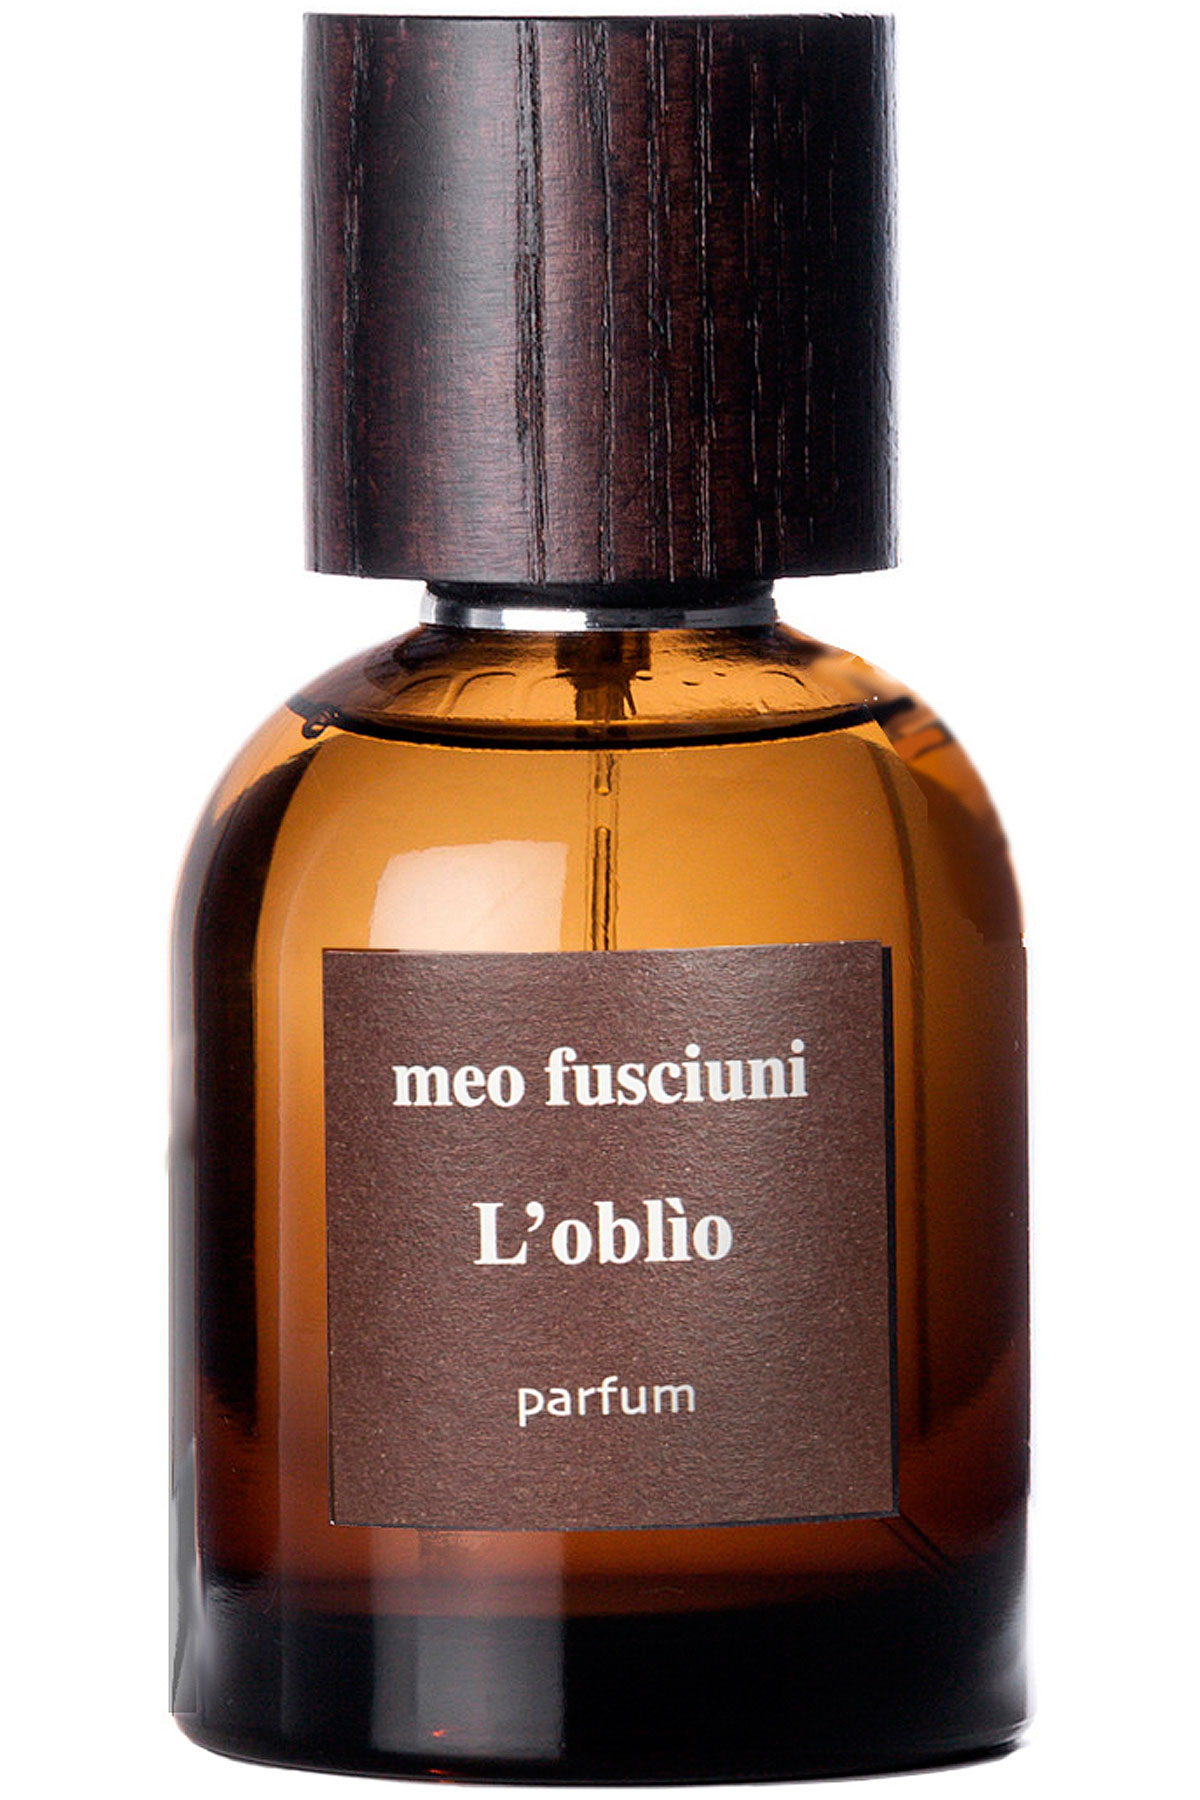 Meo Fusciuni Fragrances for Women, L Oblio - Eau De Parfum - 100 Ml, 2019, 100 ml